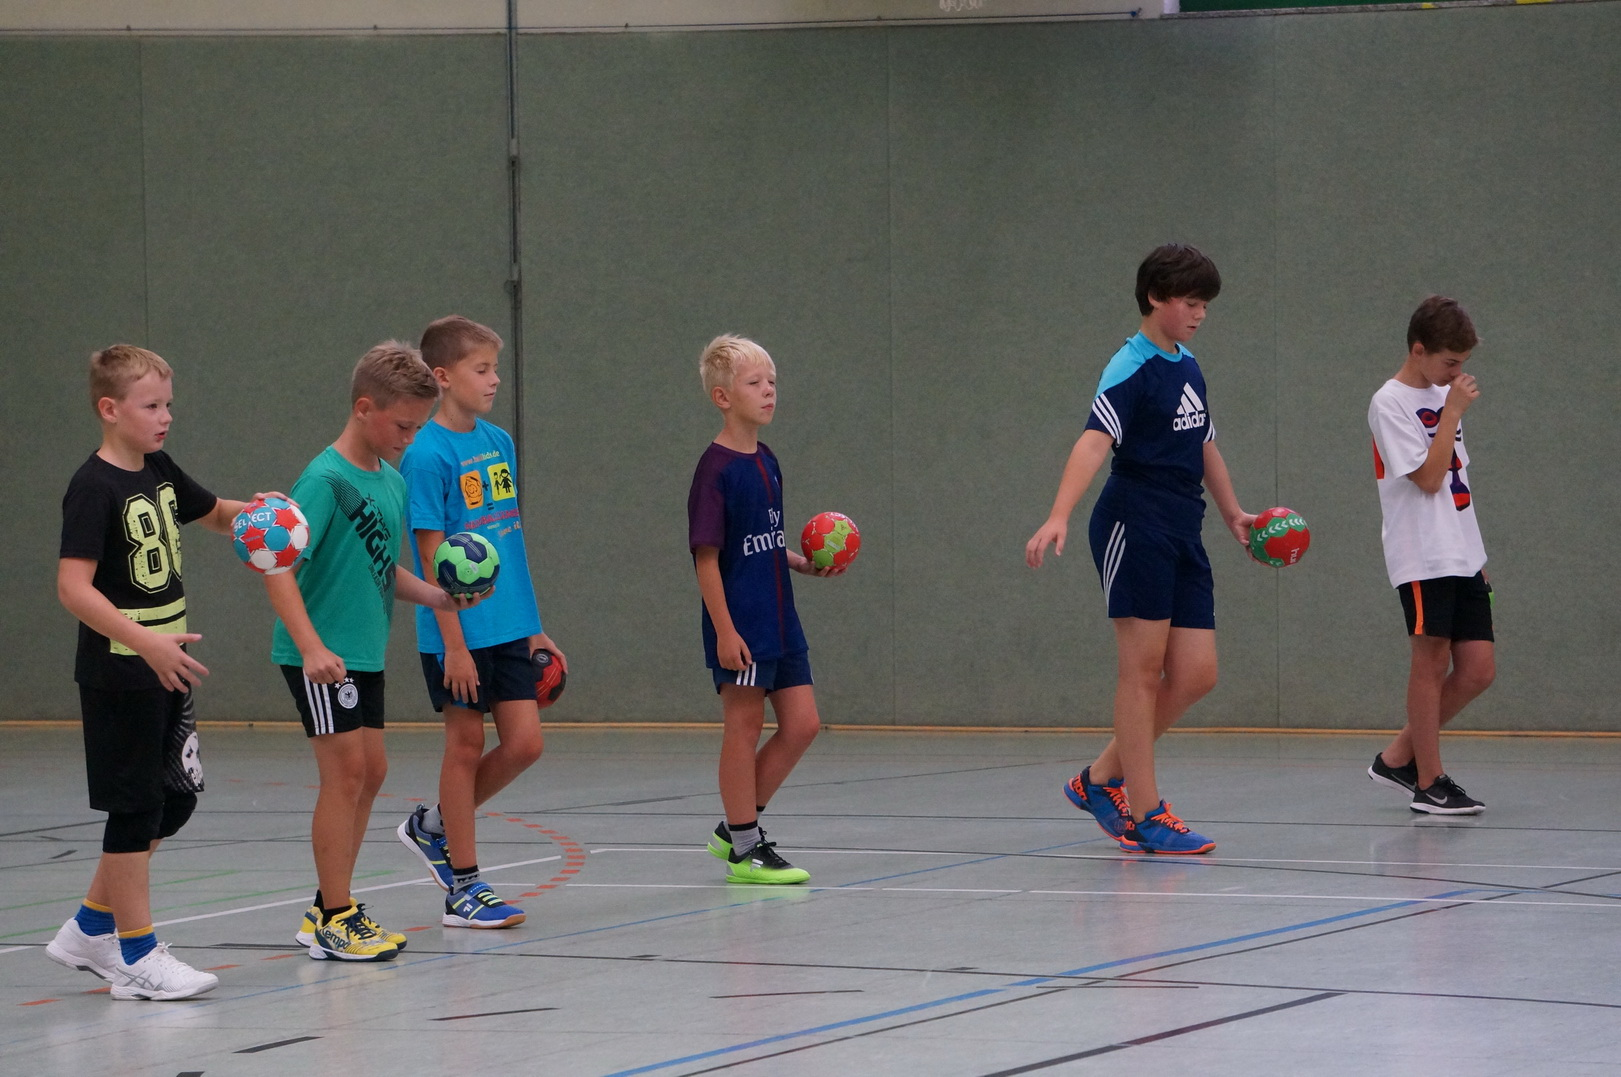 201808_Handballcamp_SDH_MG_053w